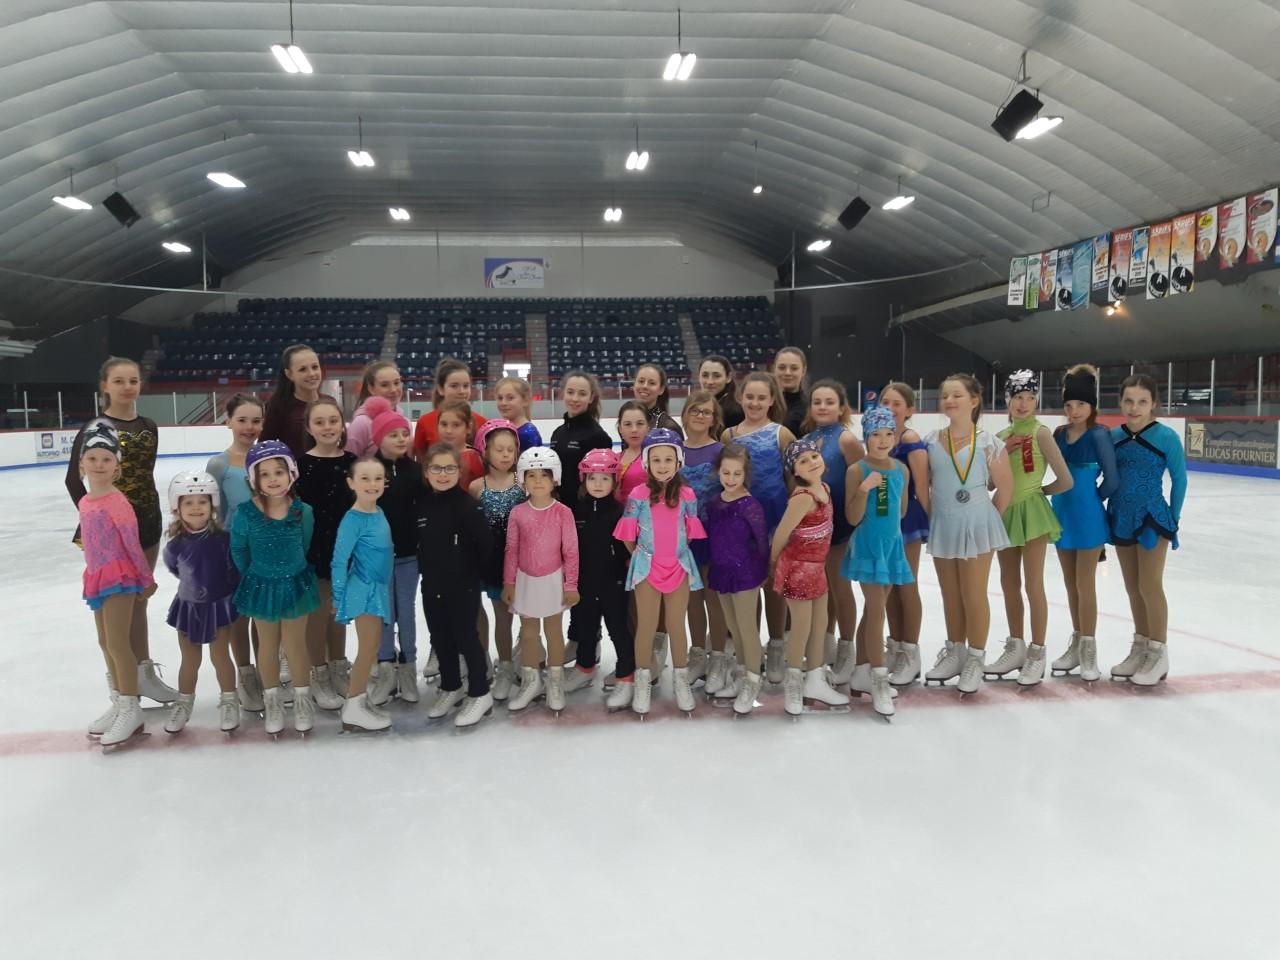 Club de patinage artistique Chic-Chocs